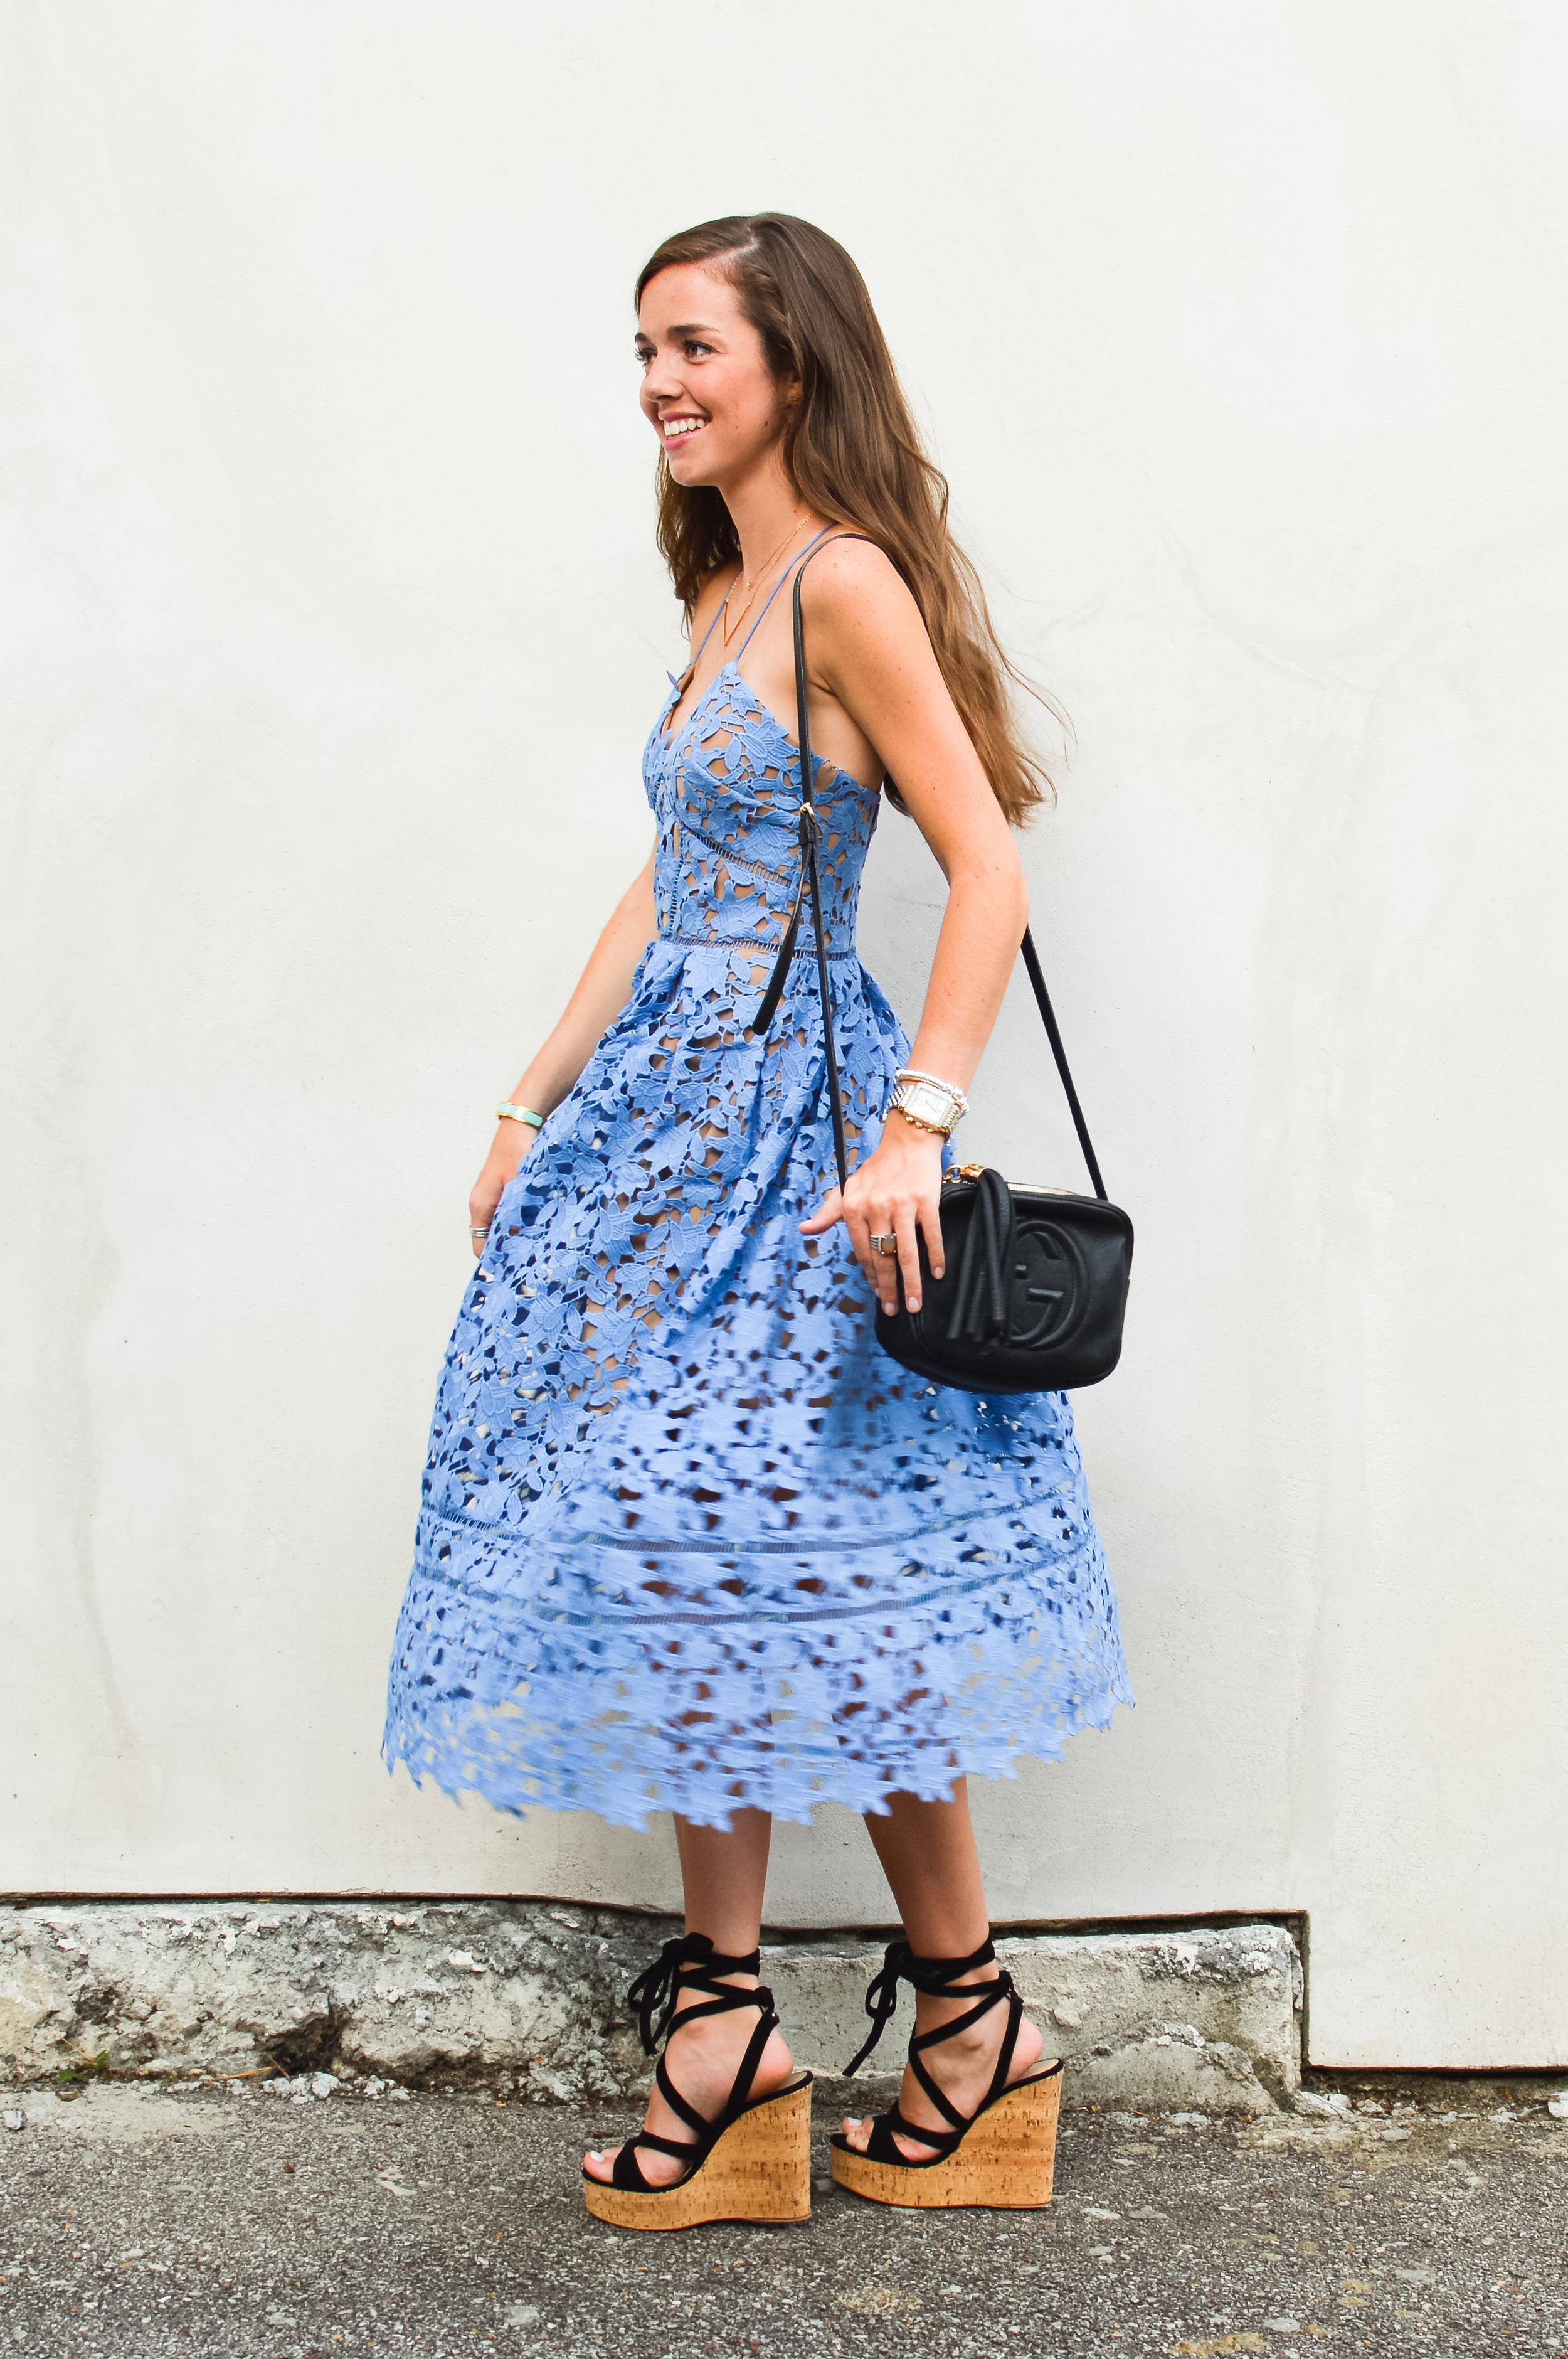 lcb_style_fashion_blogger_selfportrait_dress (39 of 48).jpg